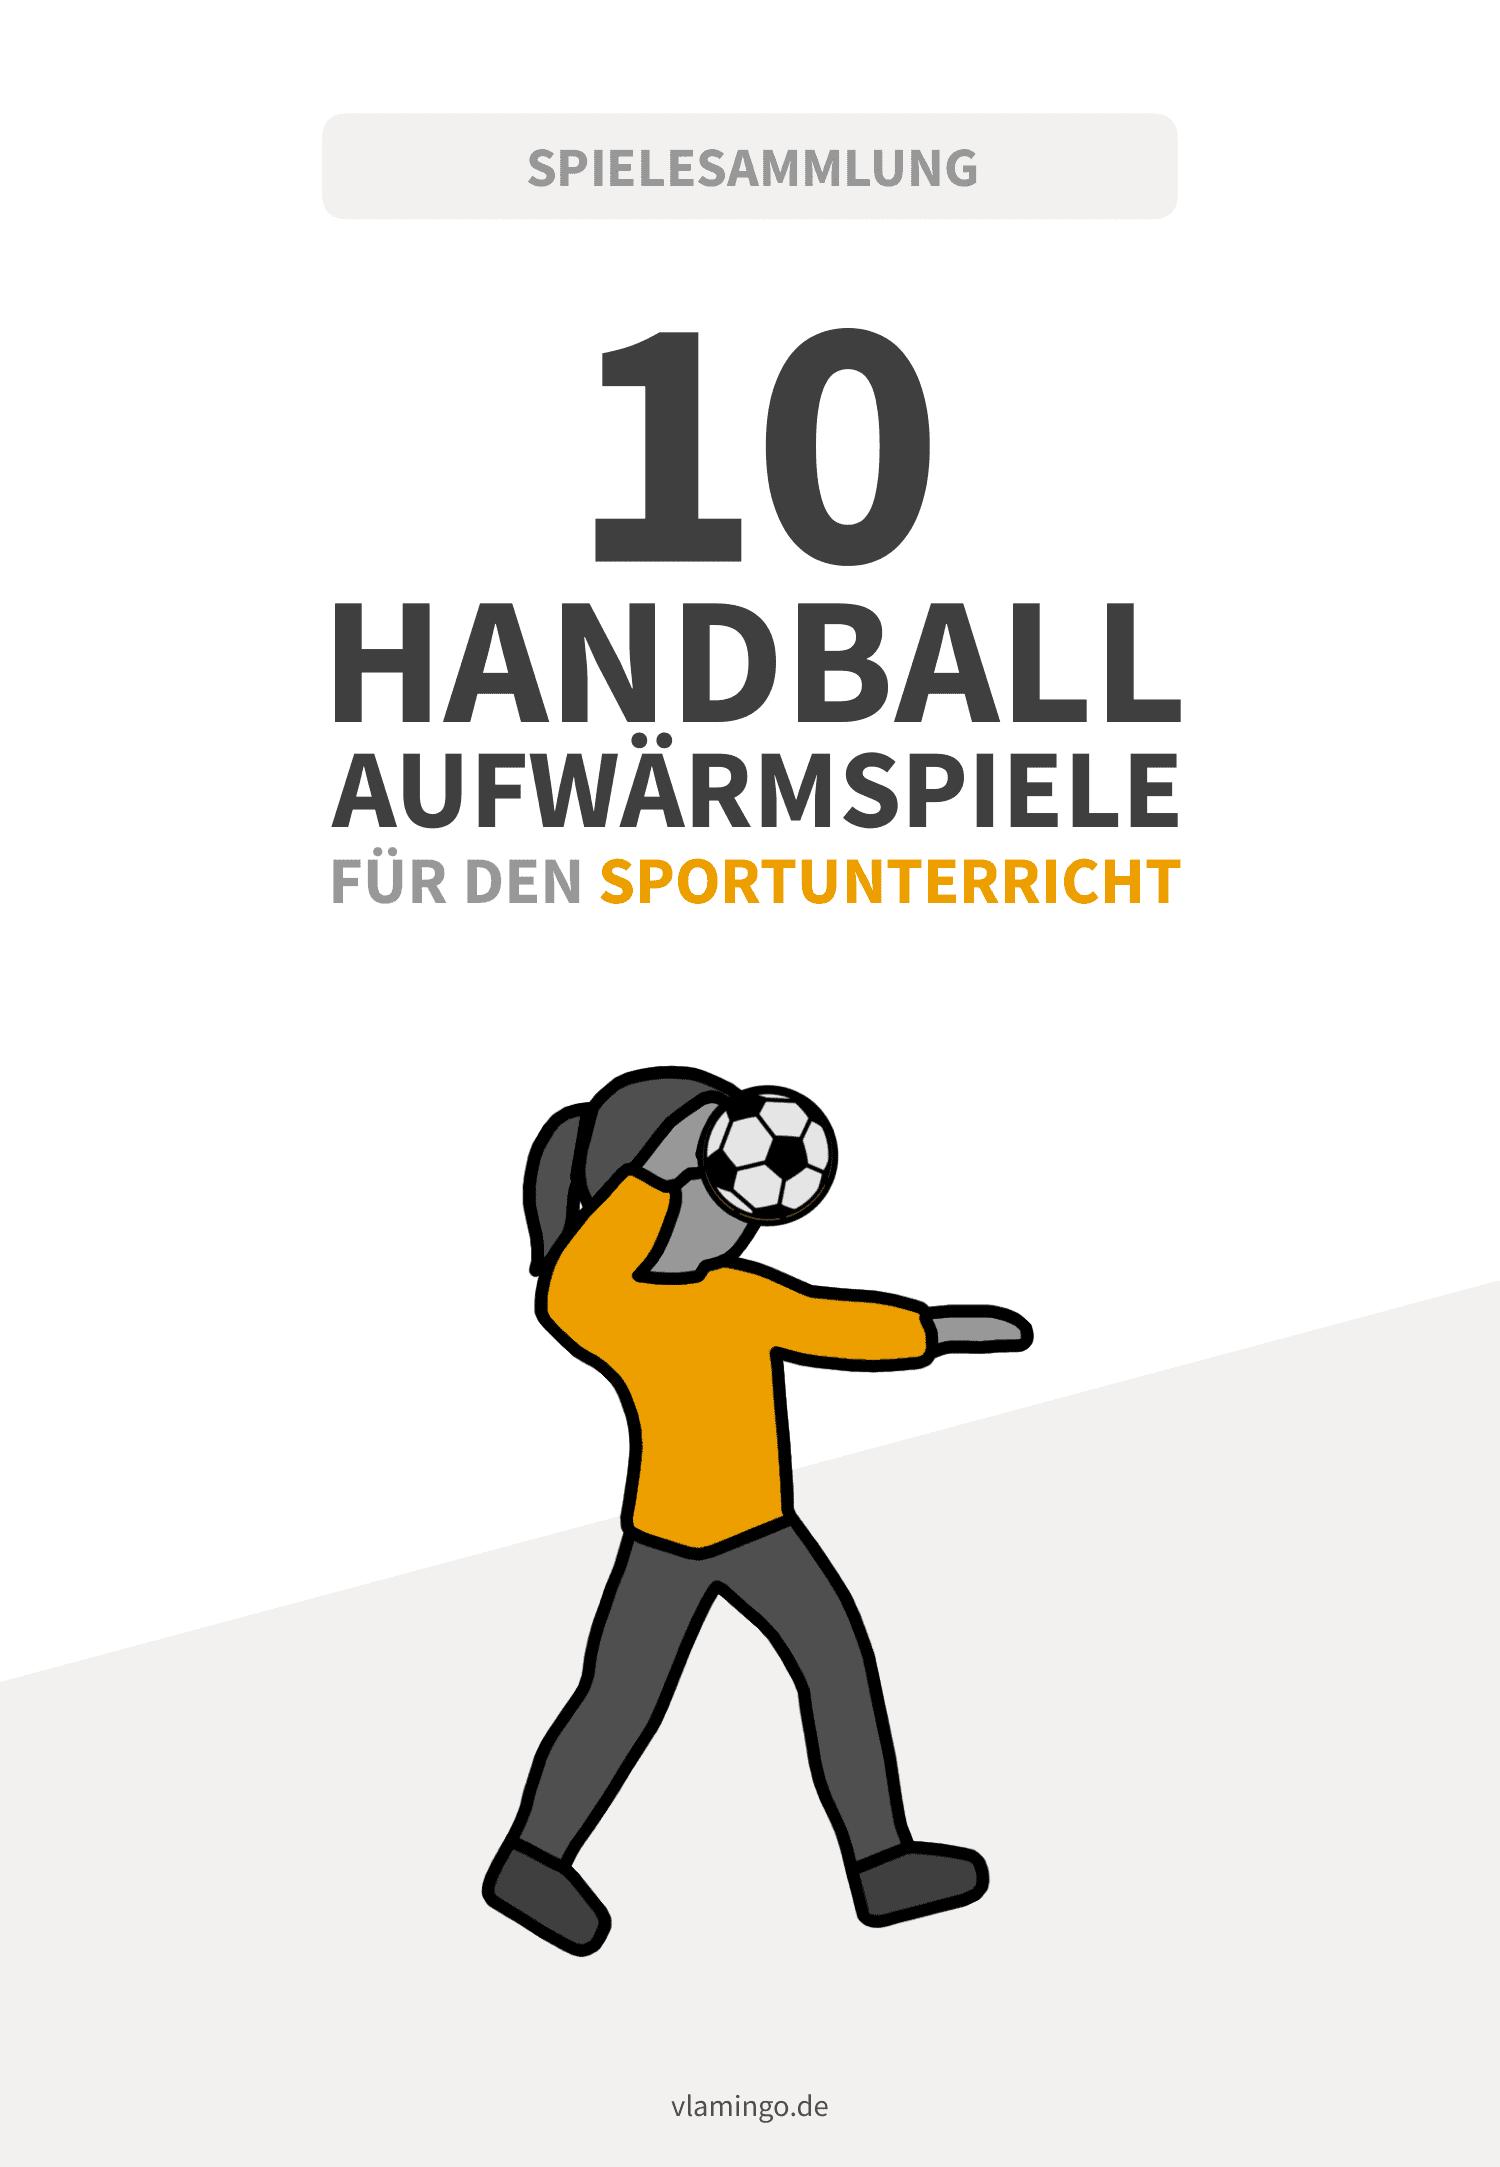 Handball - Aufwärmspiele